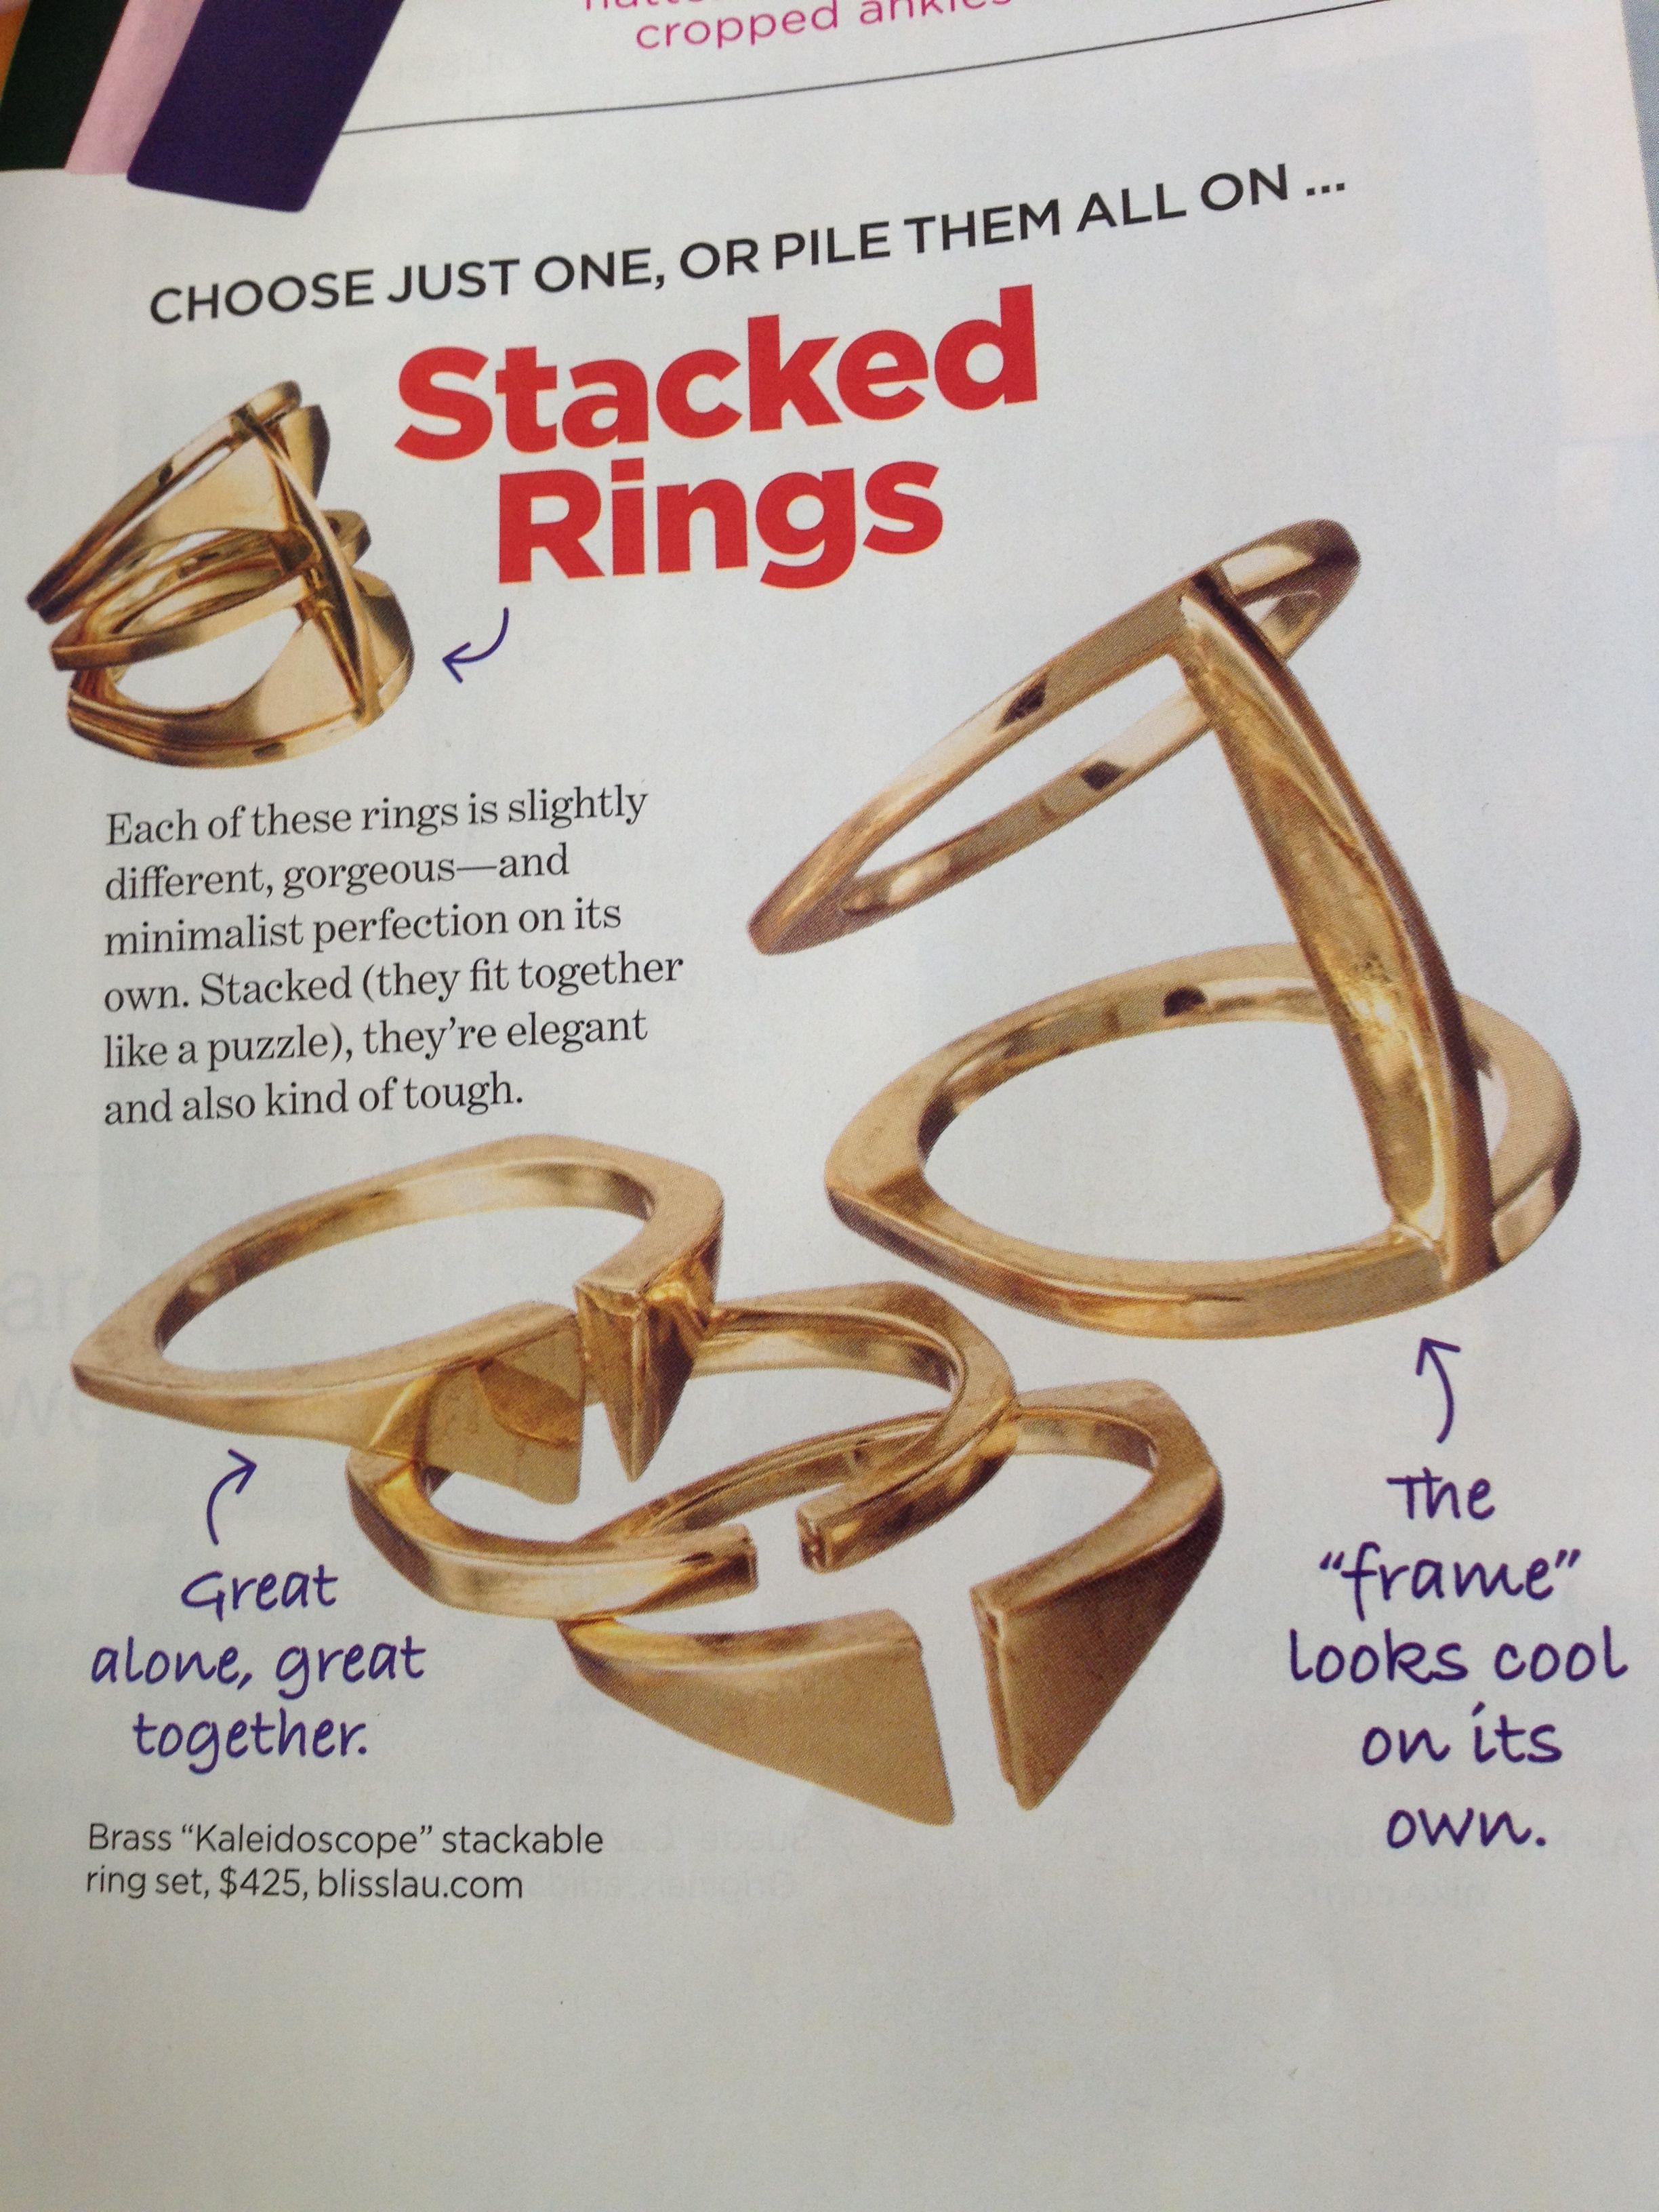 Dope ring!